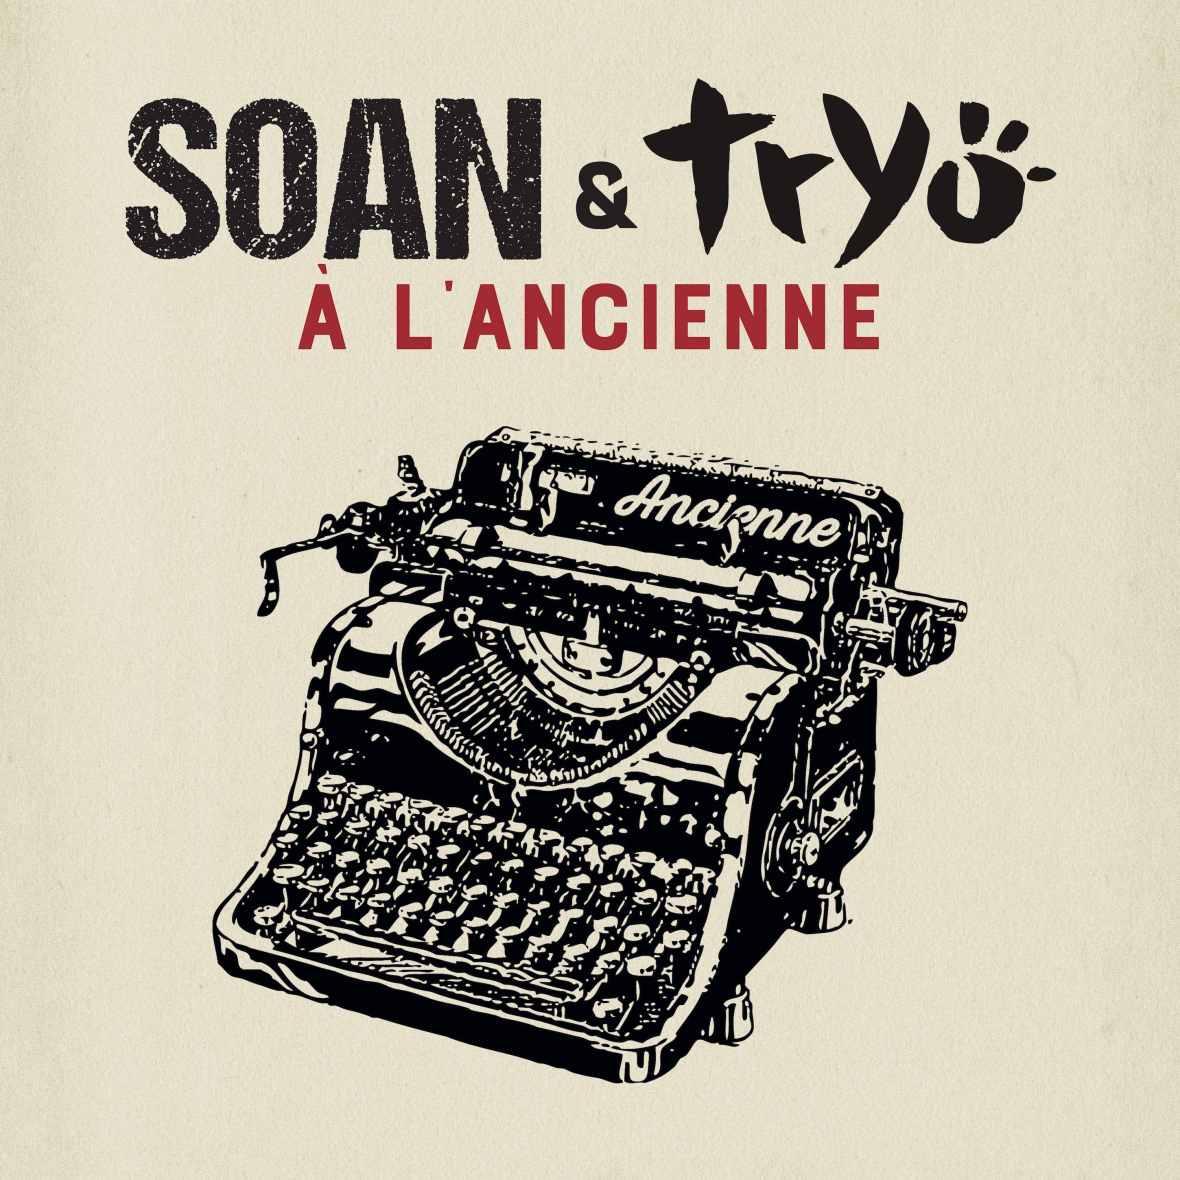 SOAN & TRYO À L'ancienne